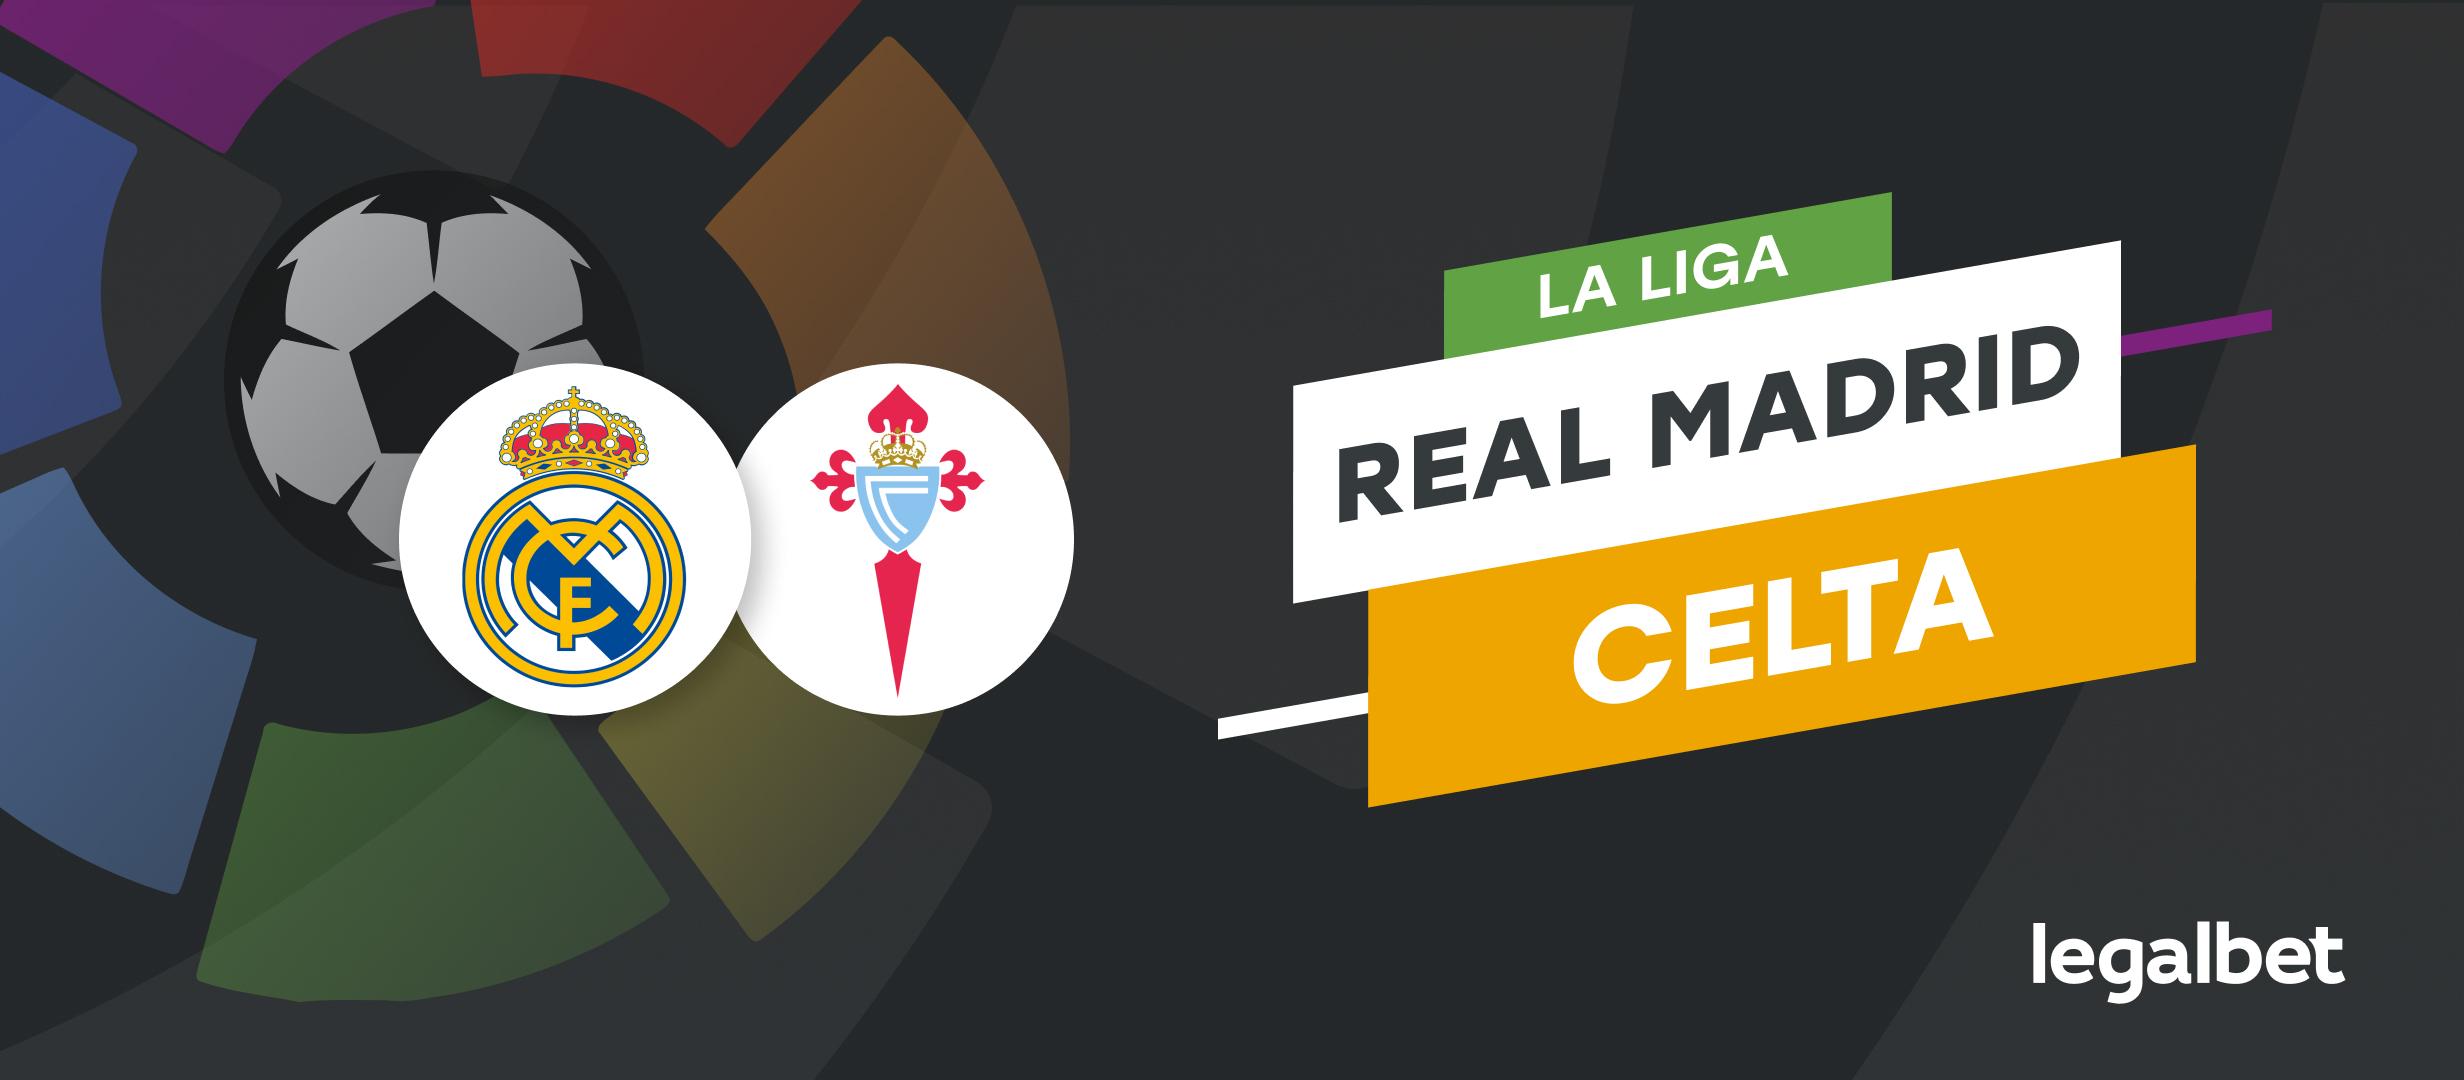 Apuestas Real Madrid - Celta